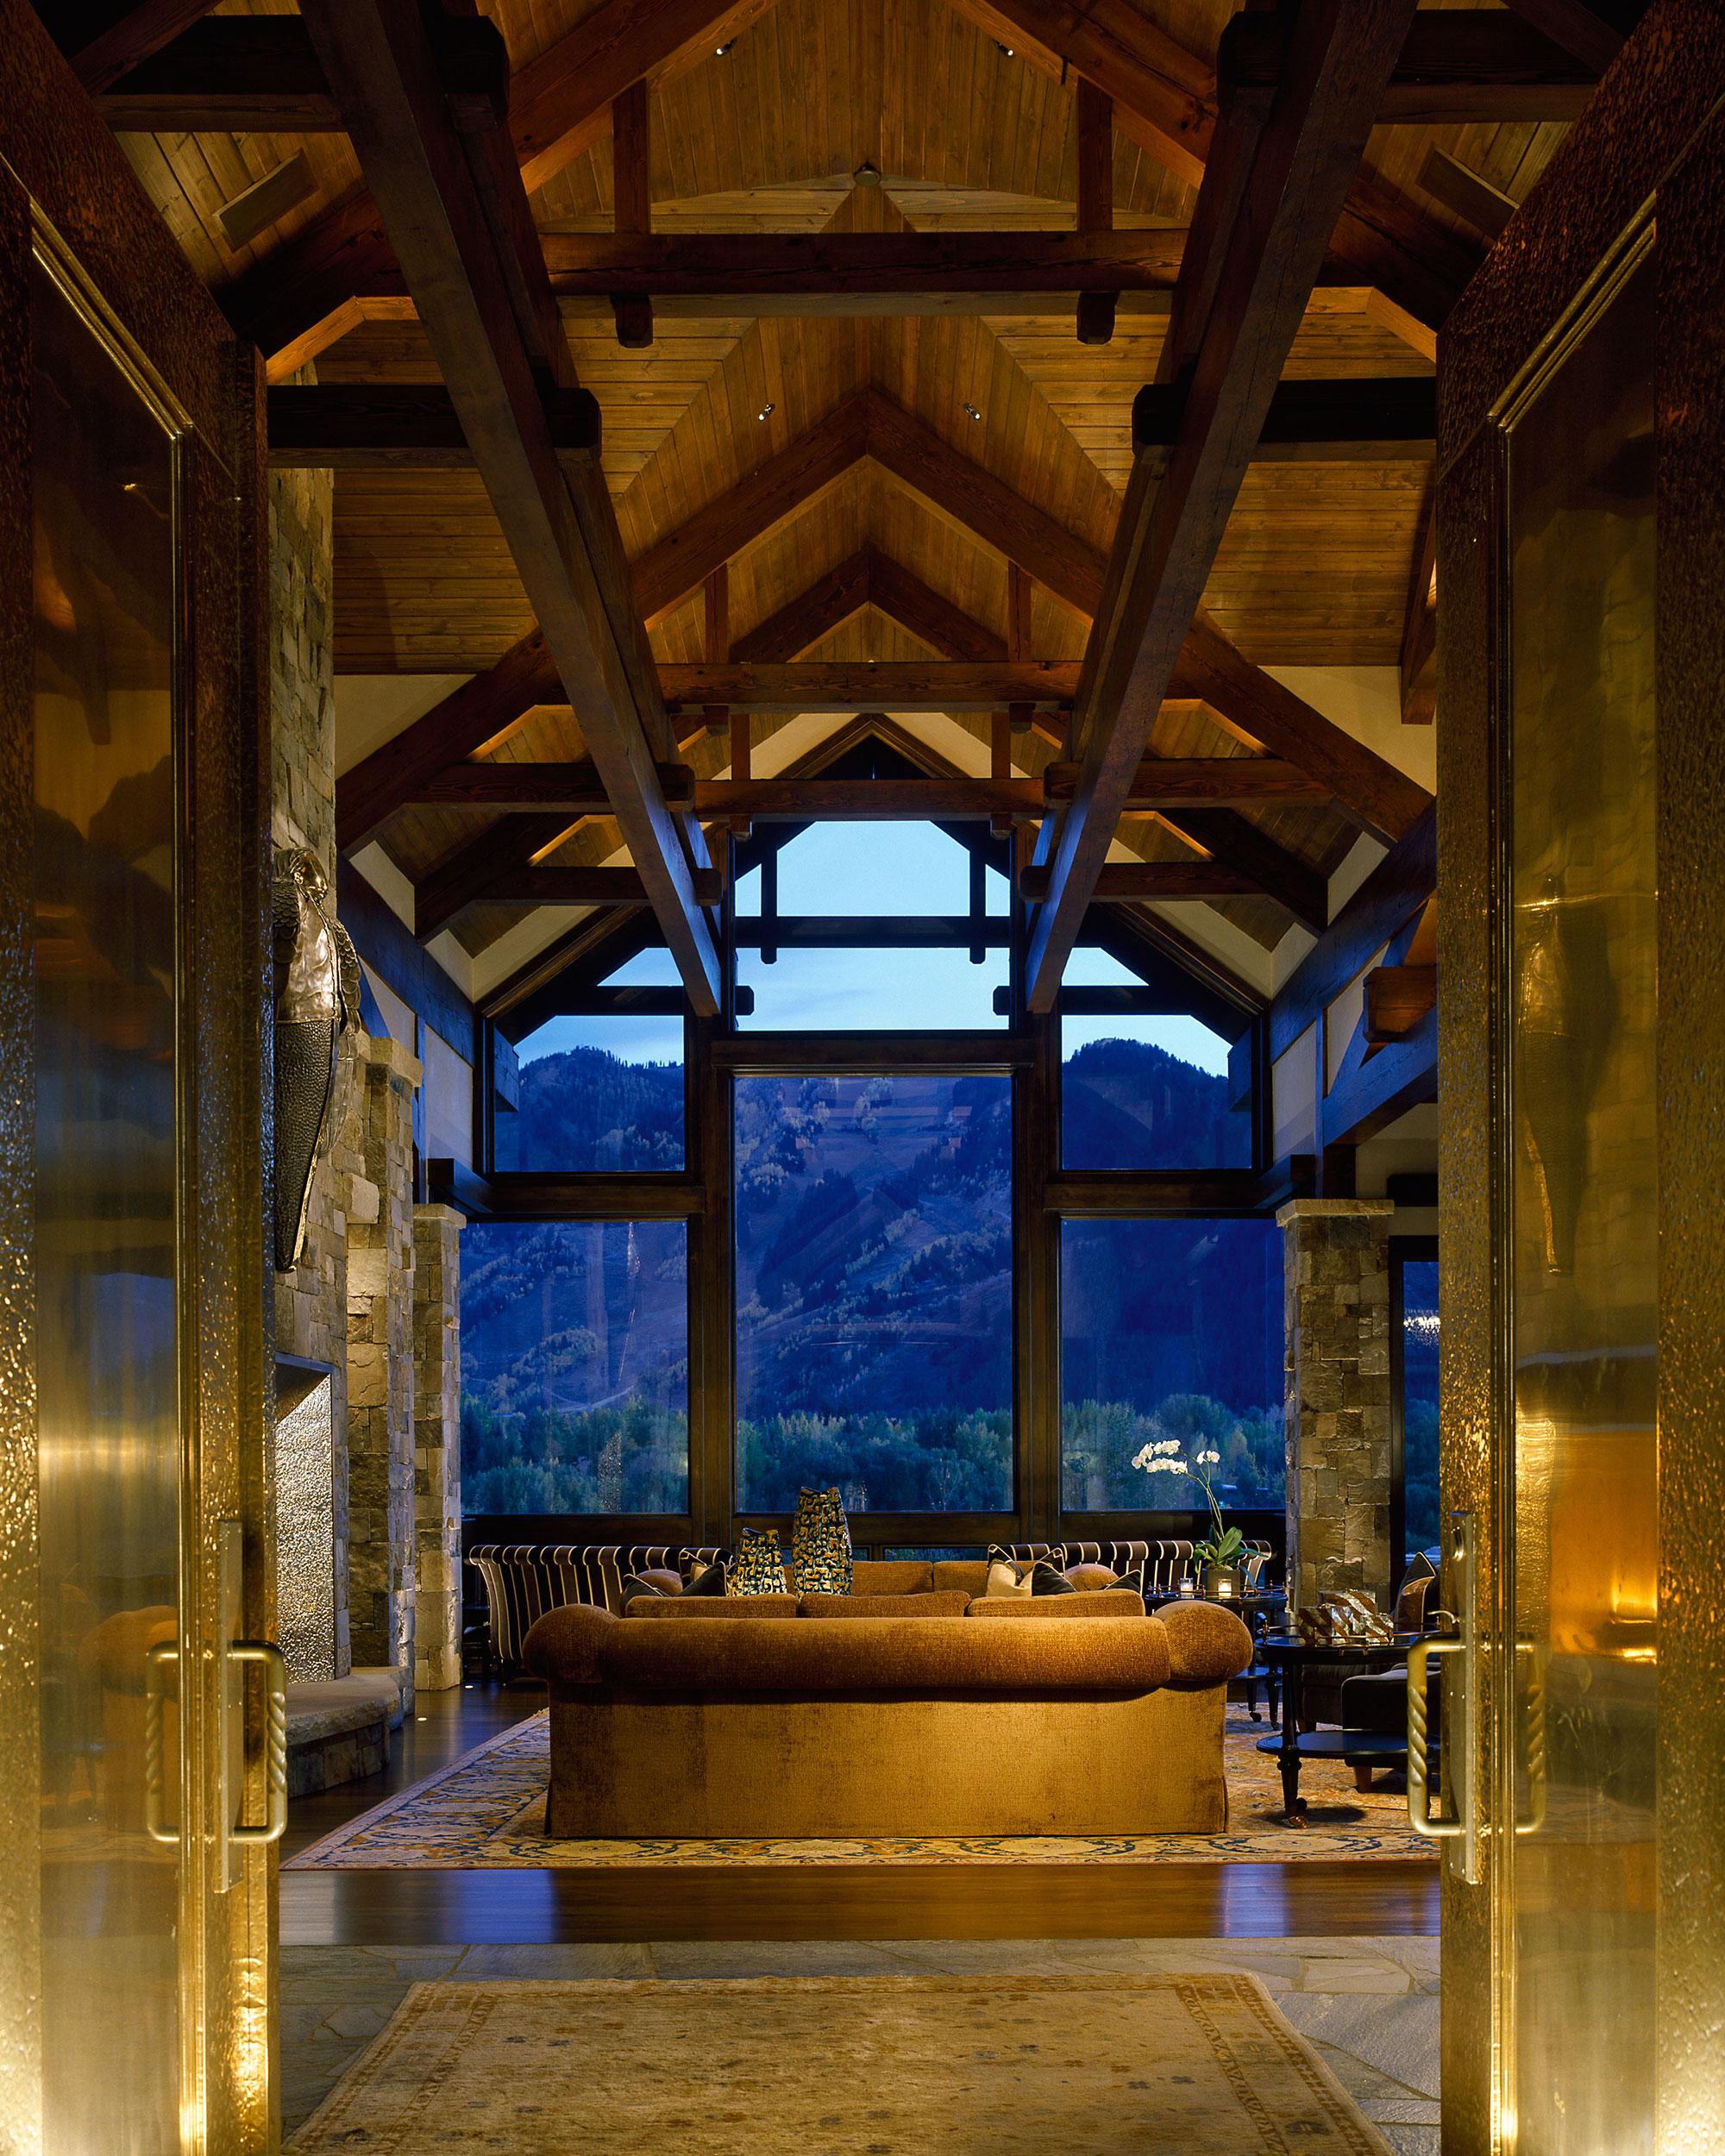 aspen manor Livingroom aspen manor charles cunniffe architects,Aspen Style Home Designs